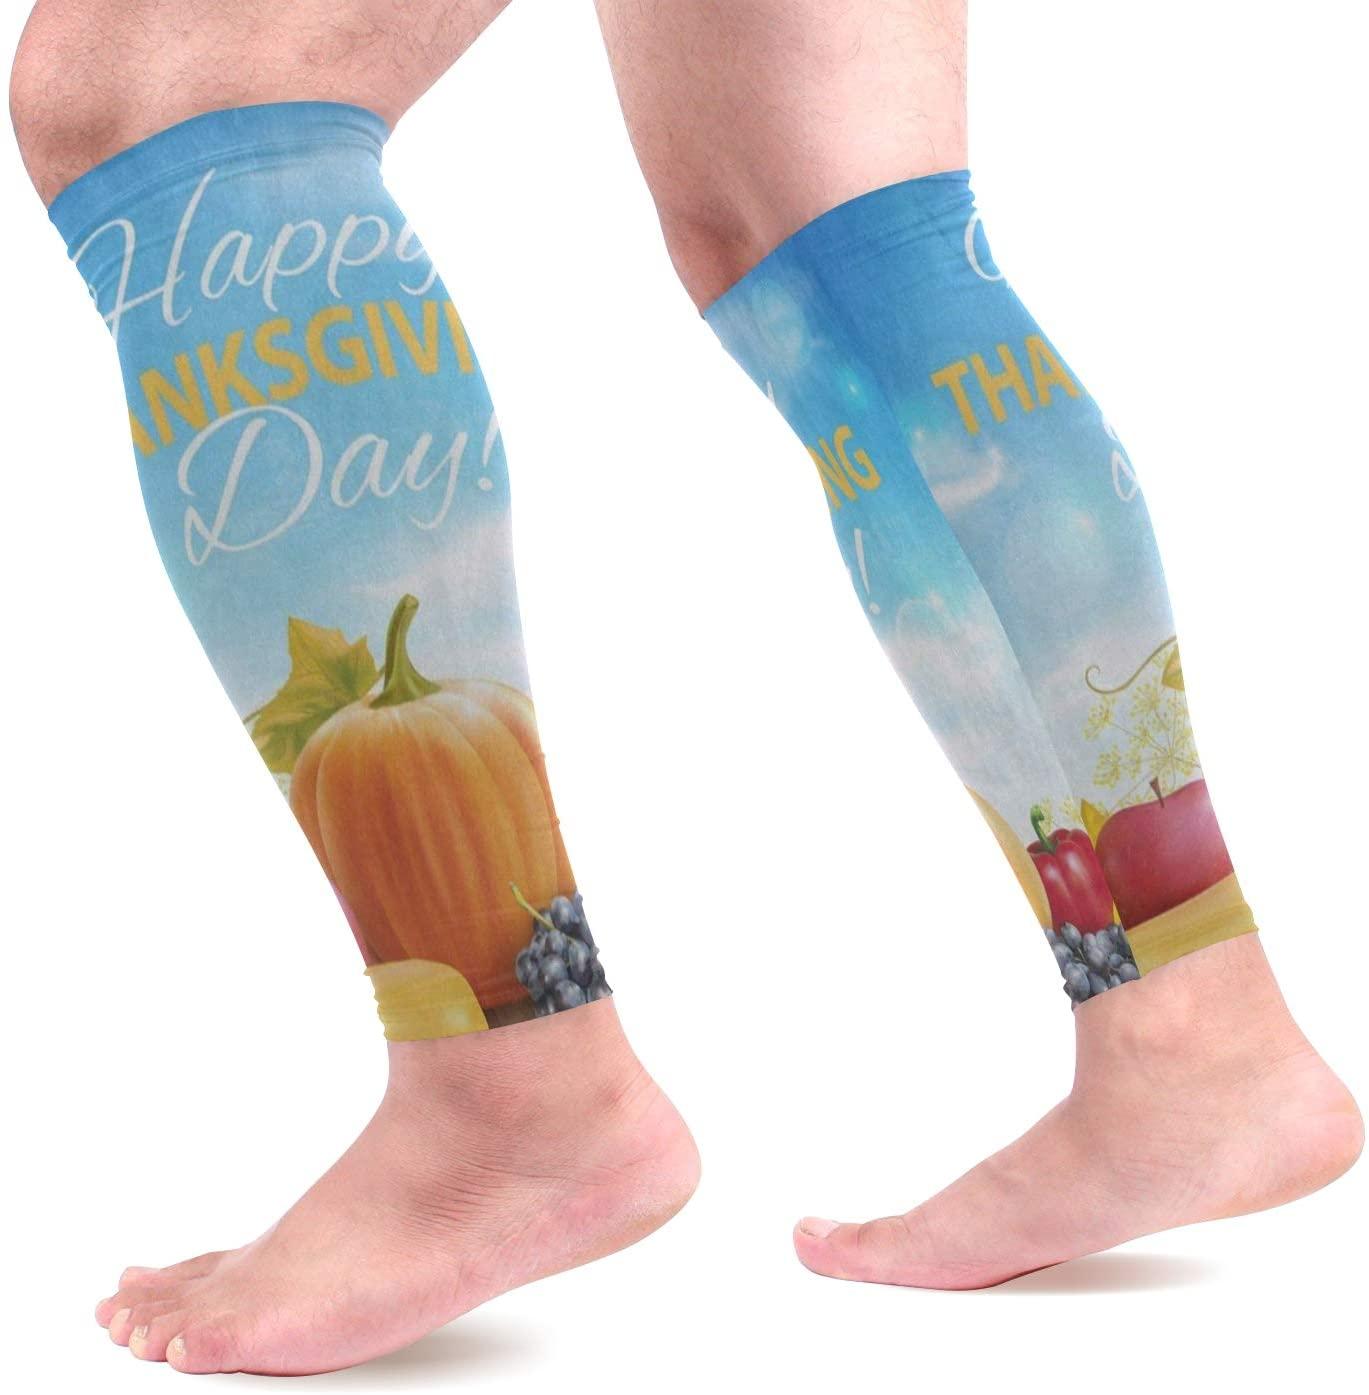 Calf Compression Sleeves Happy Thanksgiving Pumpkin Grape Fruit Harvest Leg Compression Socks for Runners, Shin Splint, Varicose Vein & Calf Pain Relief - Calf Guard for Running, Cycling, Nurses Women